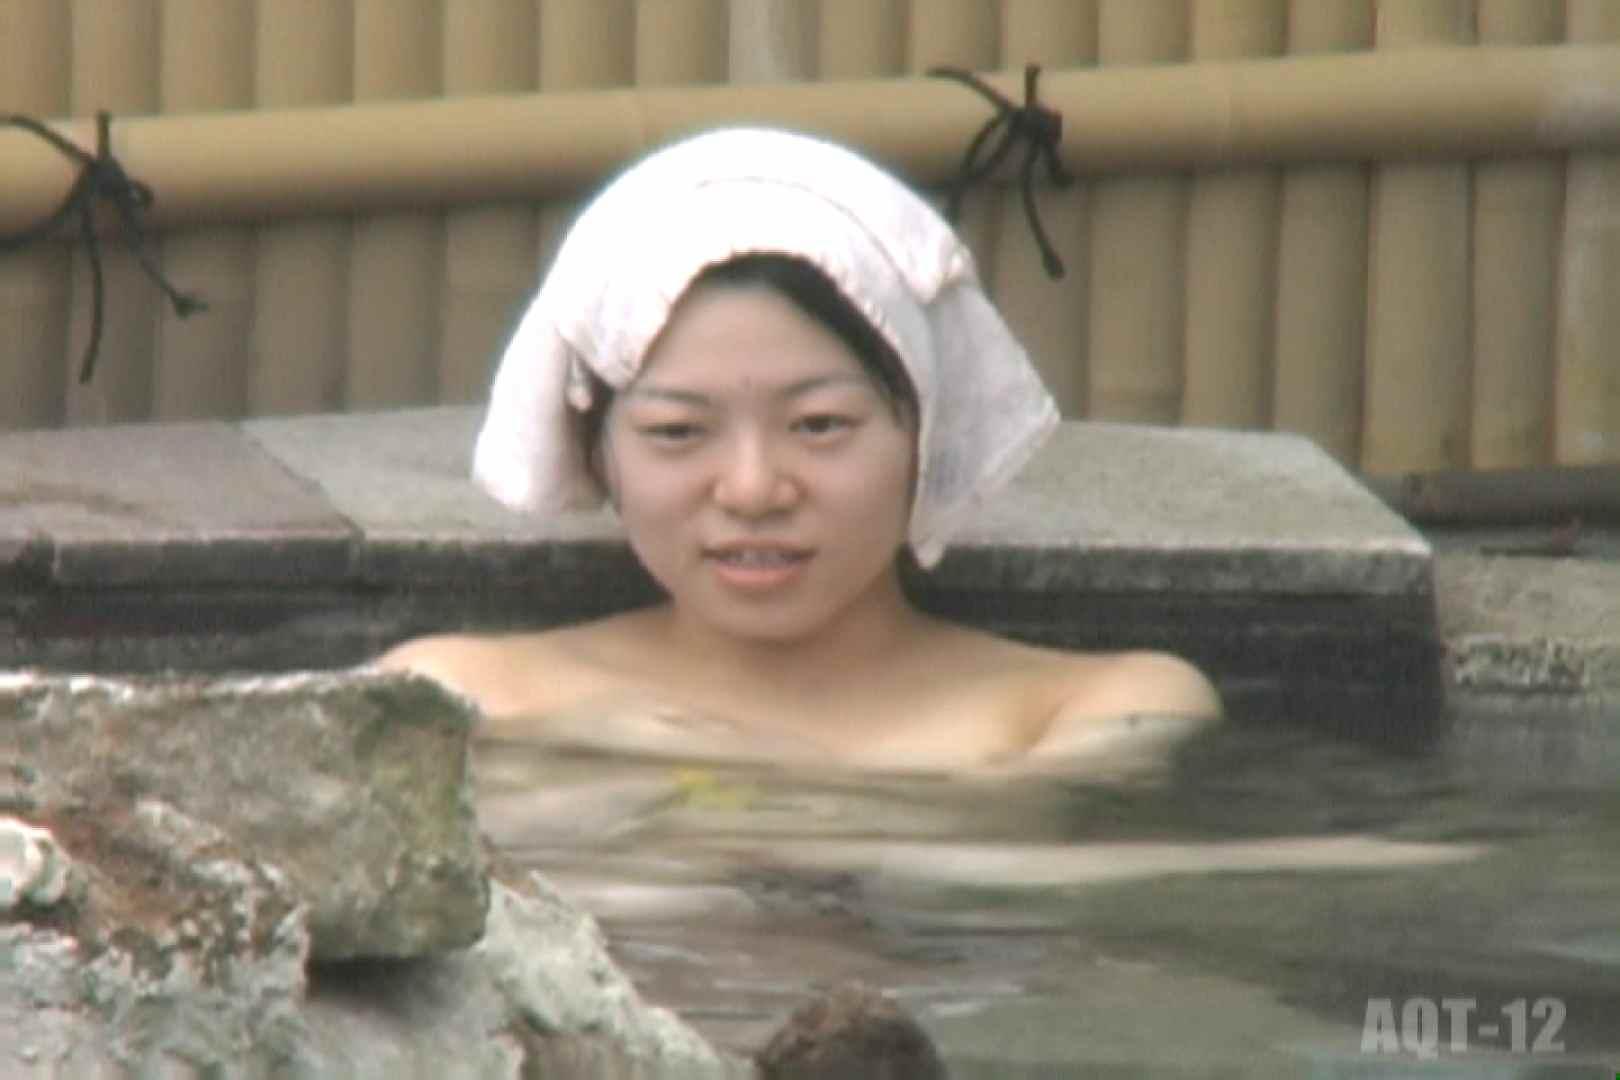 Aquaな露天風呂Vol.810 露天   OLセックス  58画像 49